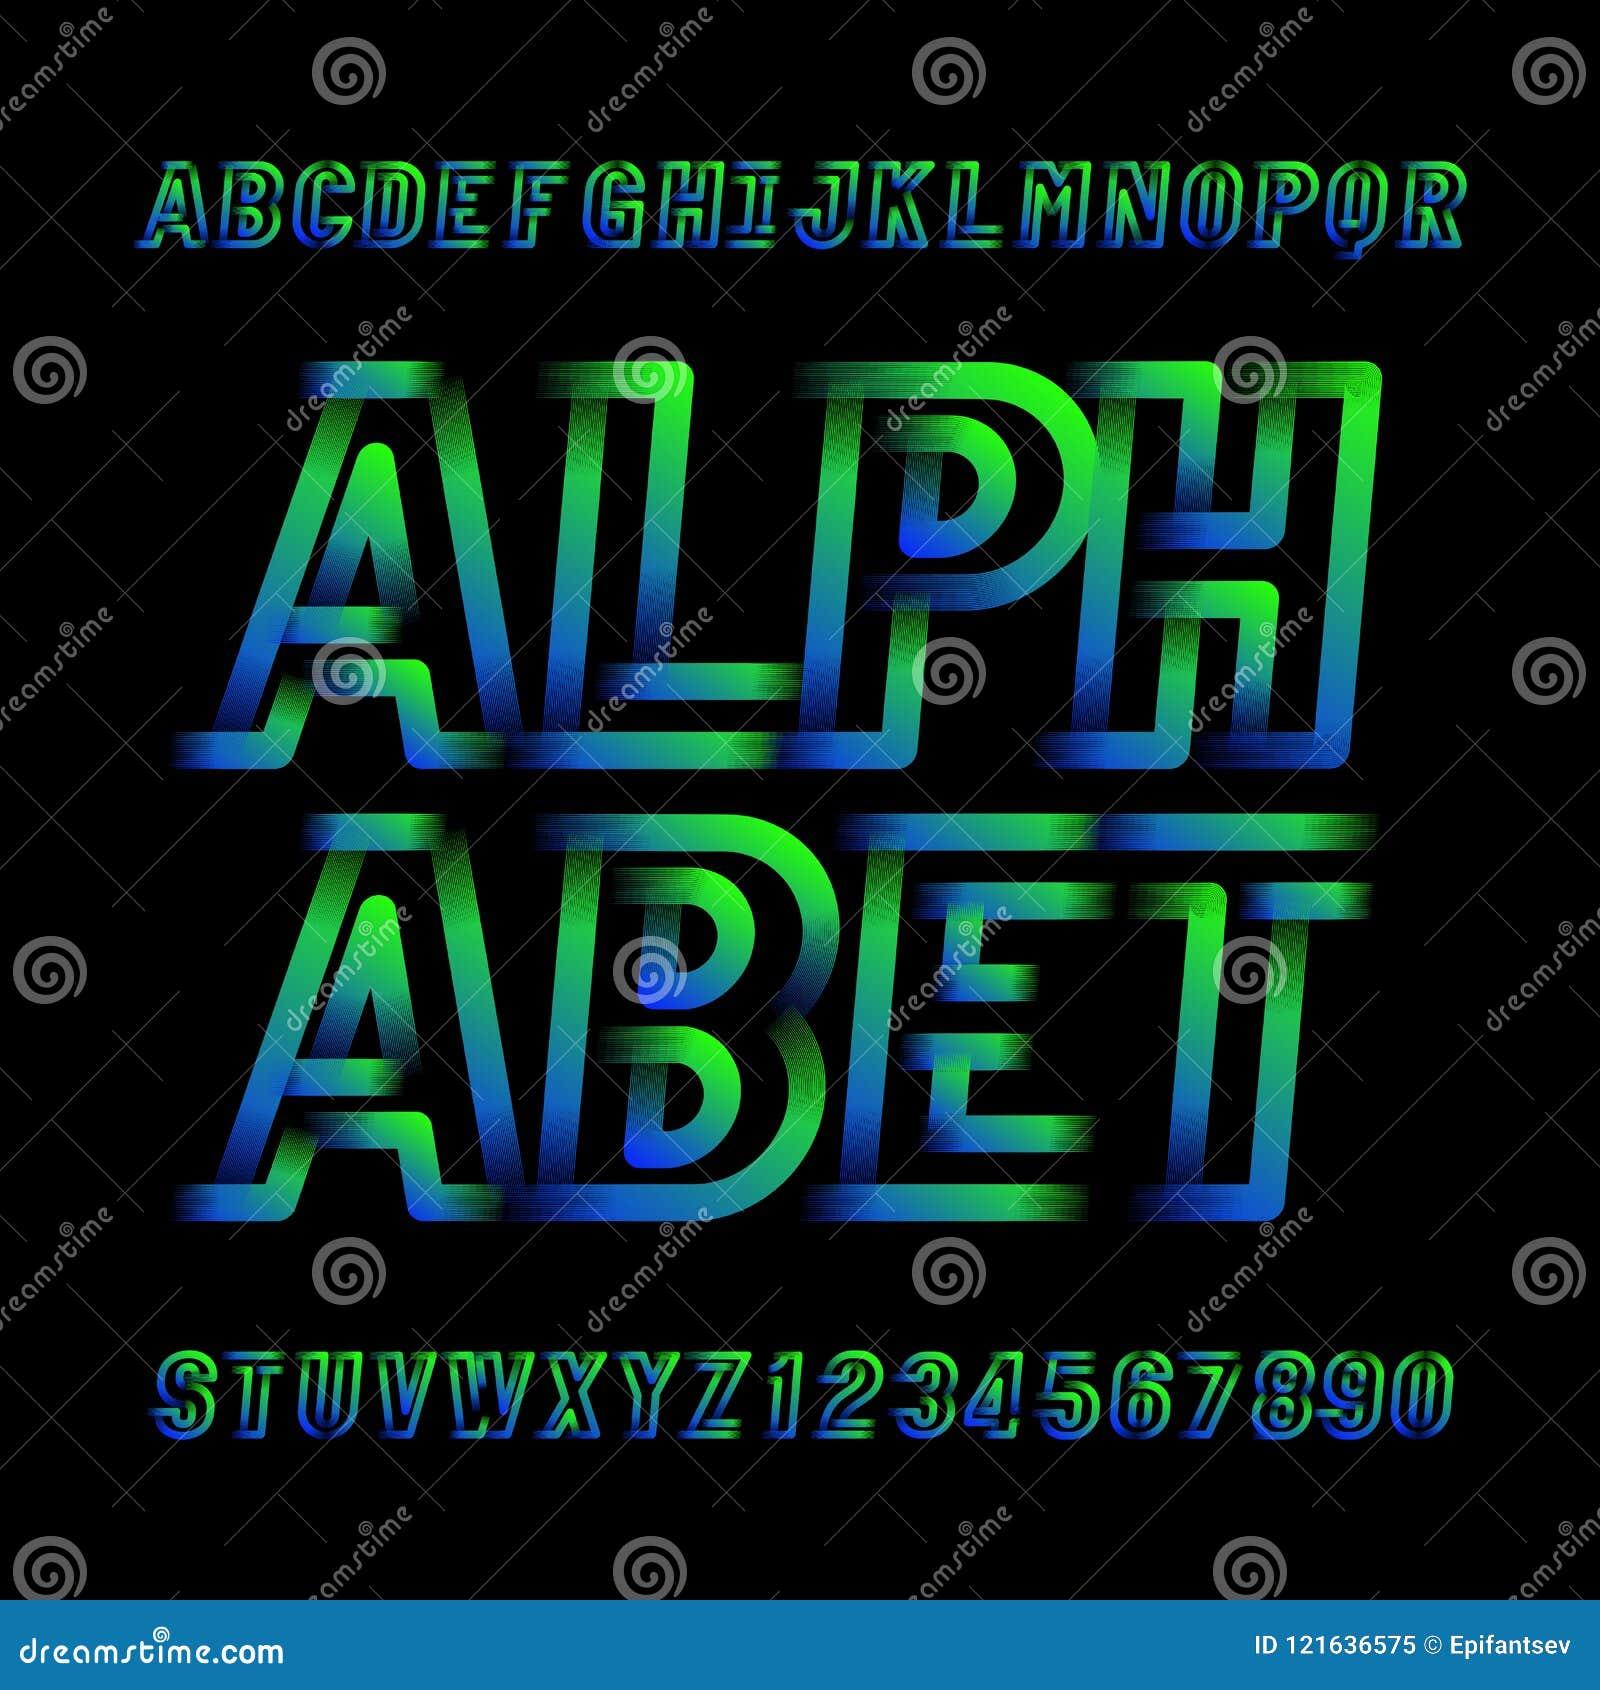 daeeb5986 Caráter tipo moderno abstrato do alfabeto Letras e números modernos do  estilo do esporte no preto Fonte de vetor para seu projeto da tipografia